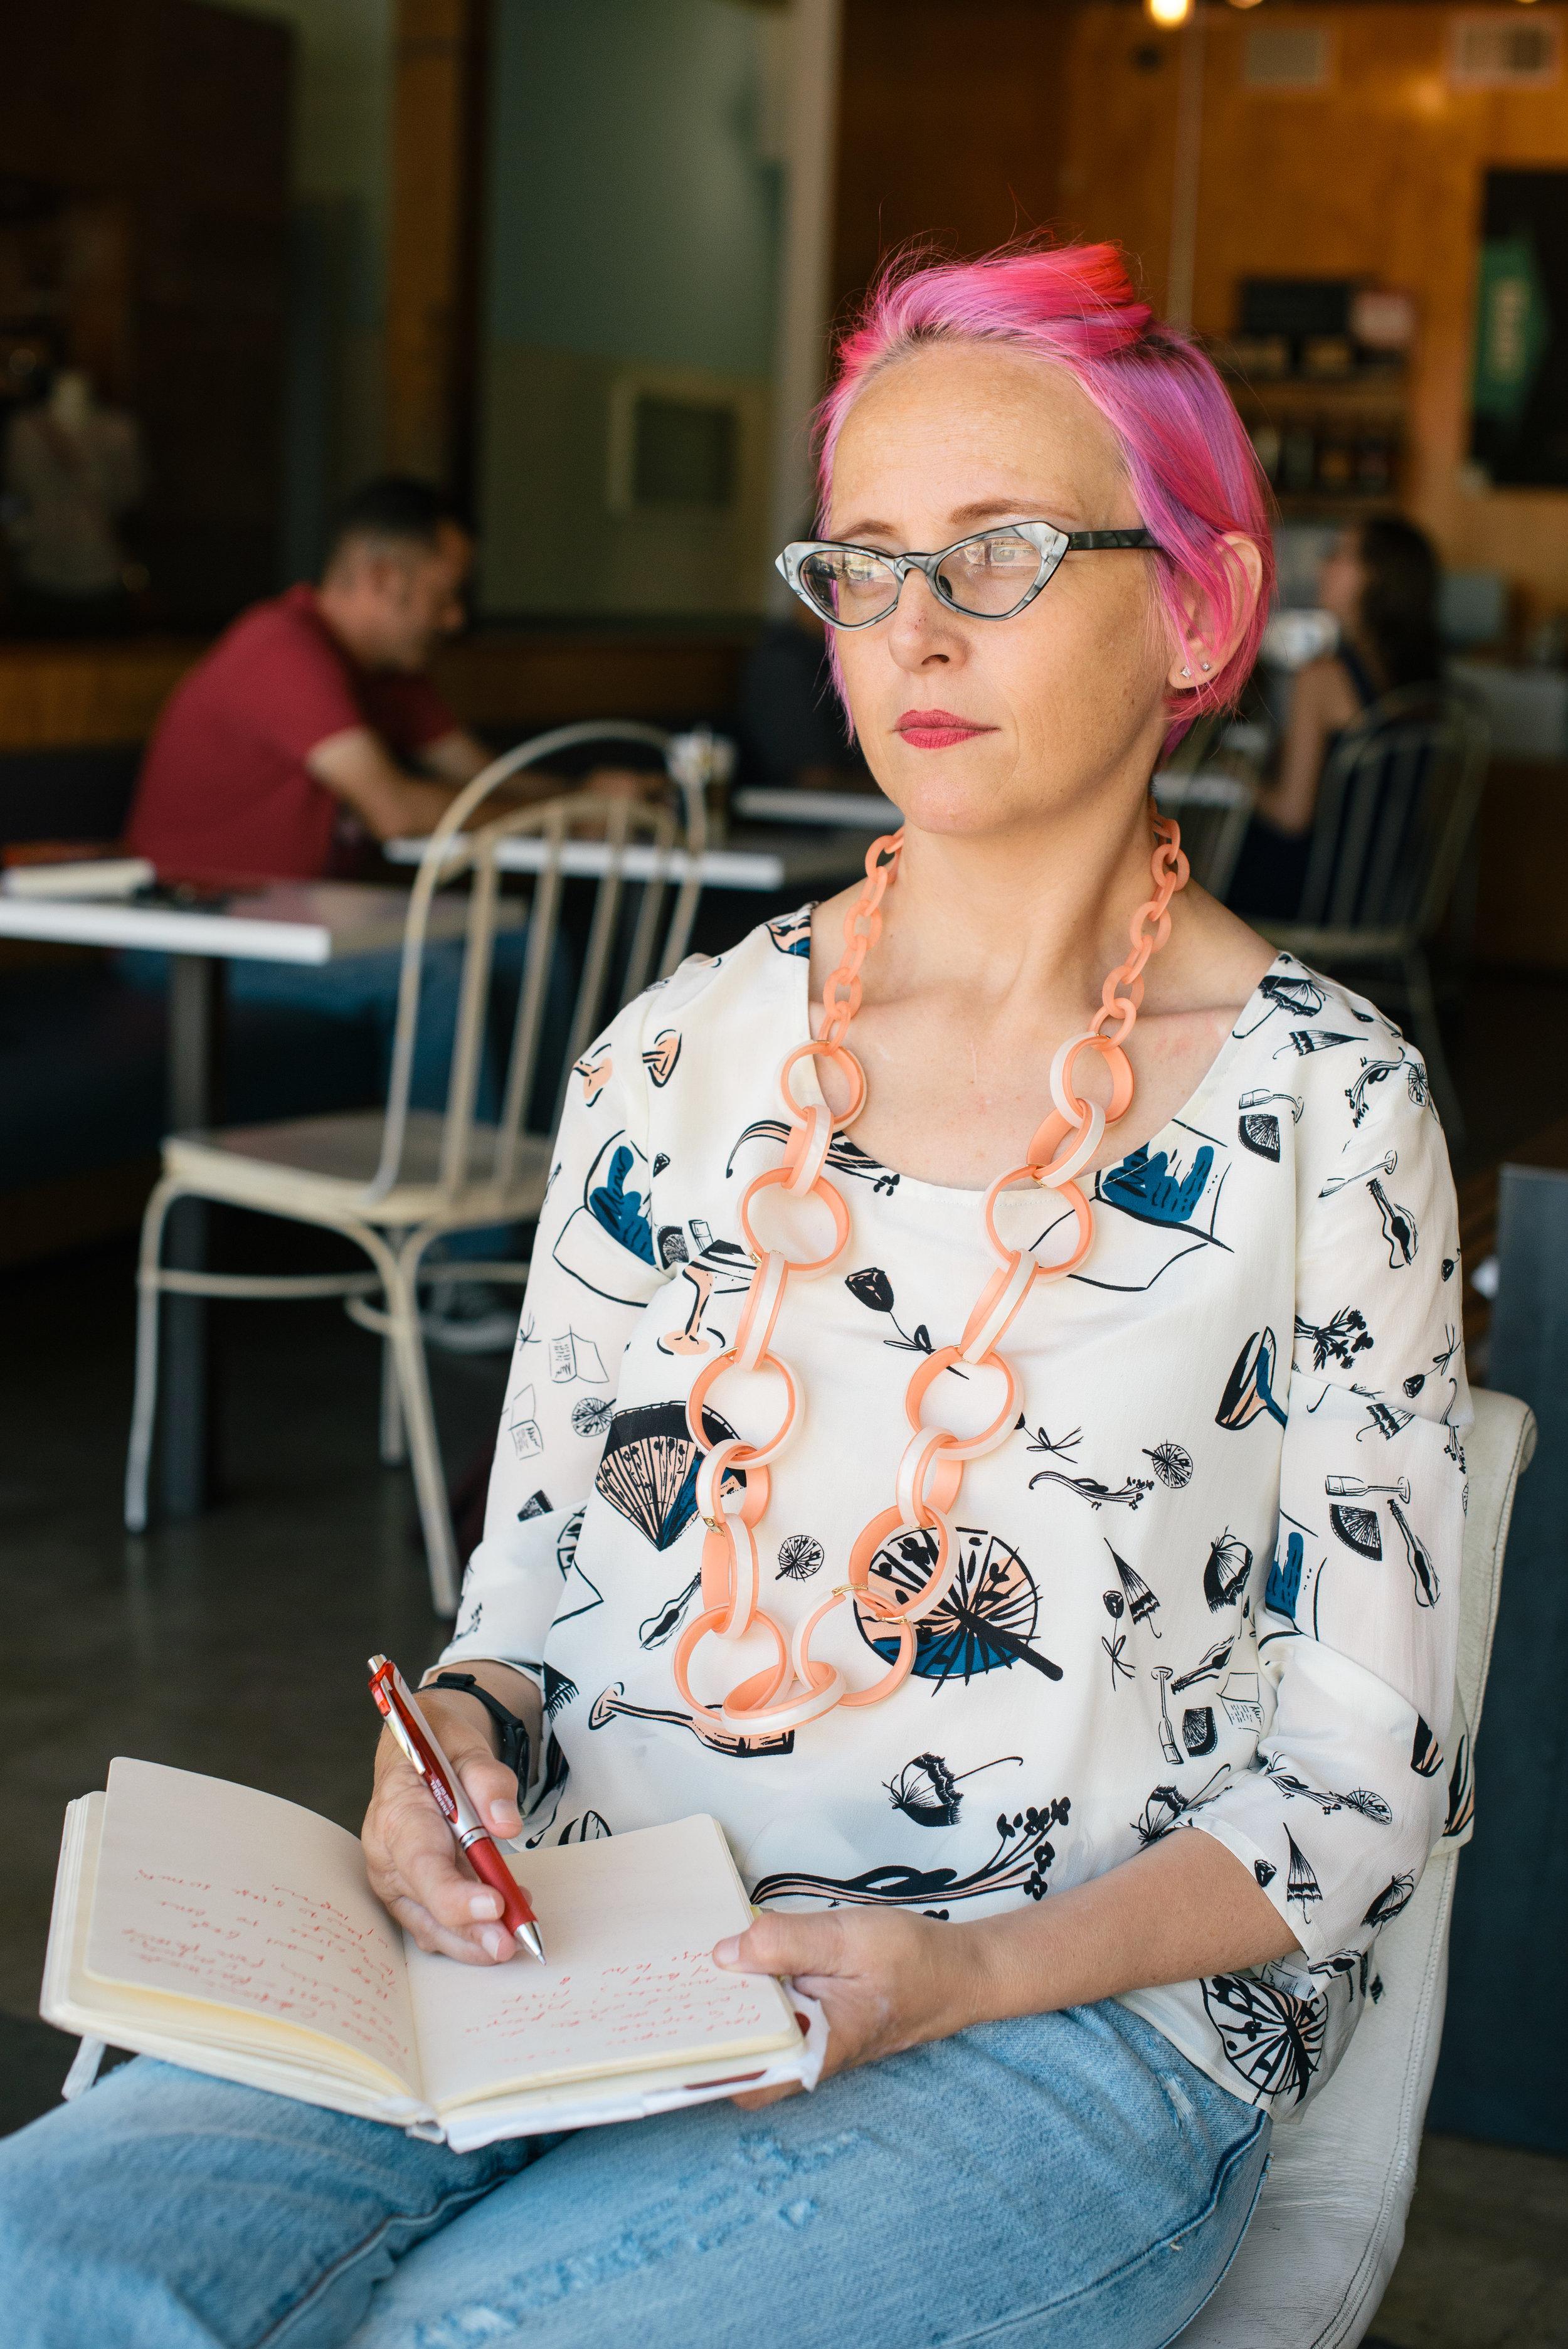 August 2017: At Giant Coffee, Phoenix, AZ. (Sarah Roberson Photography)